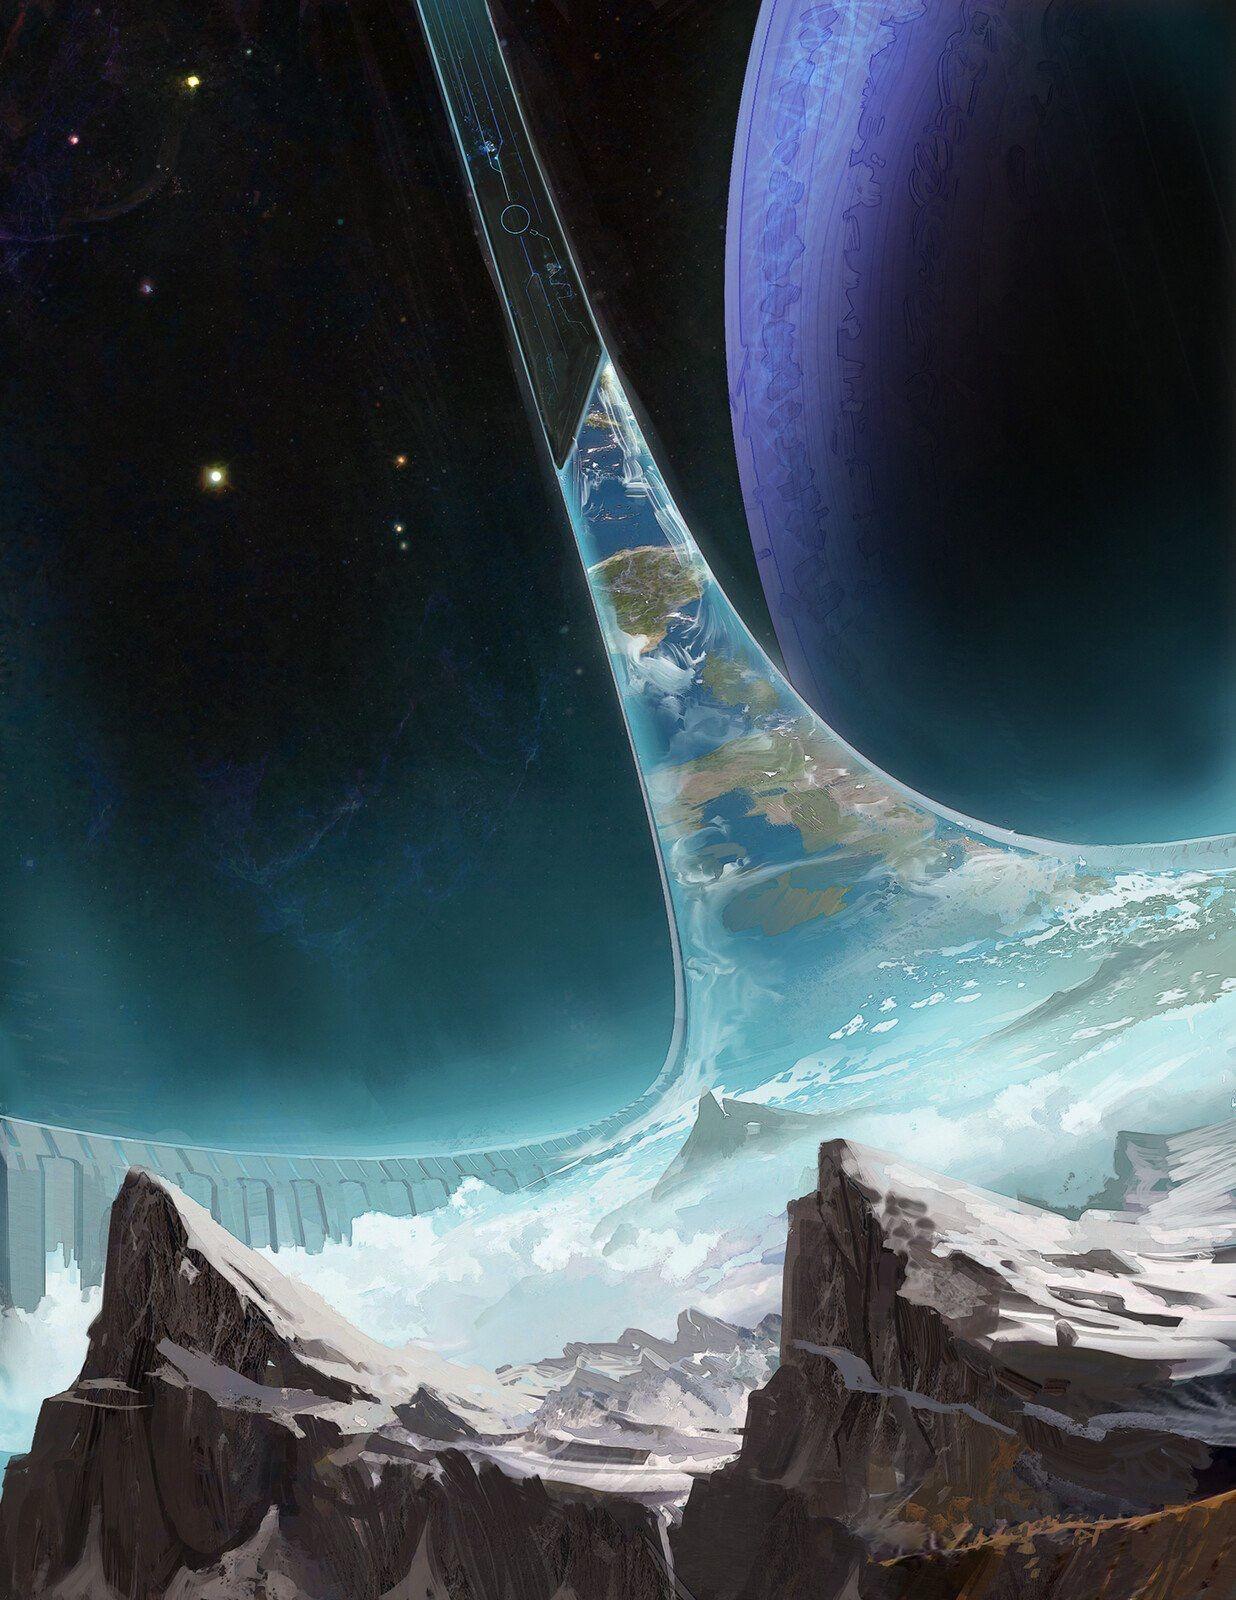 Pin By Gerard Schafhautle On Halo Halo Game Halo Videos Fantasy Landscape